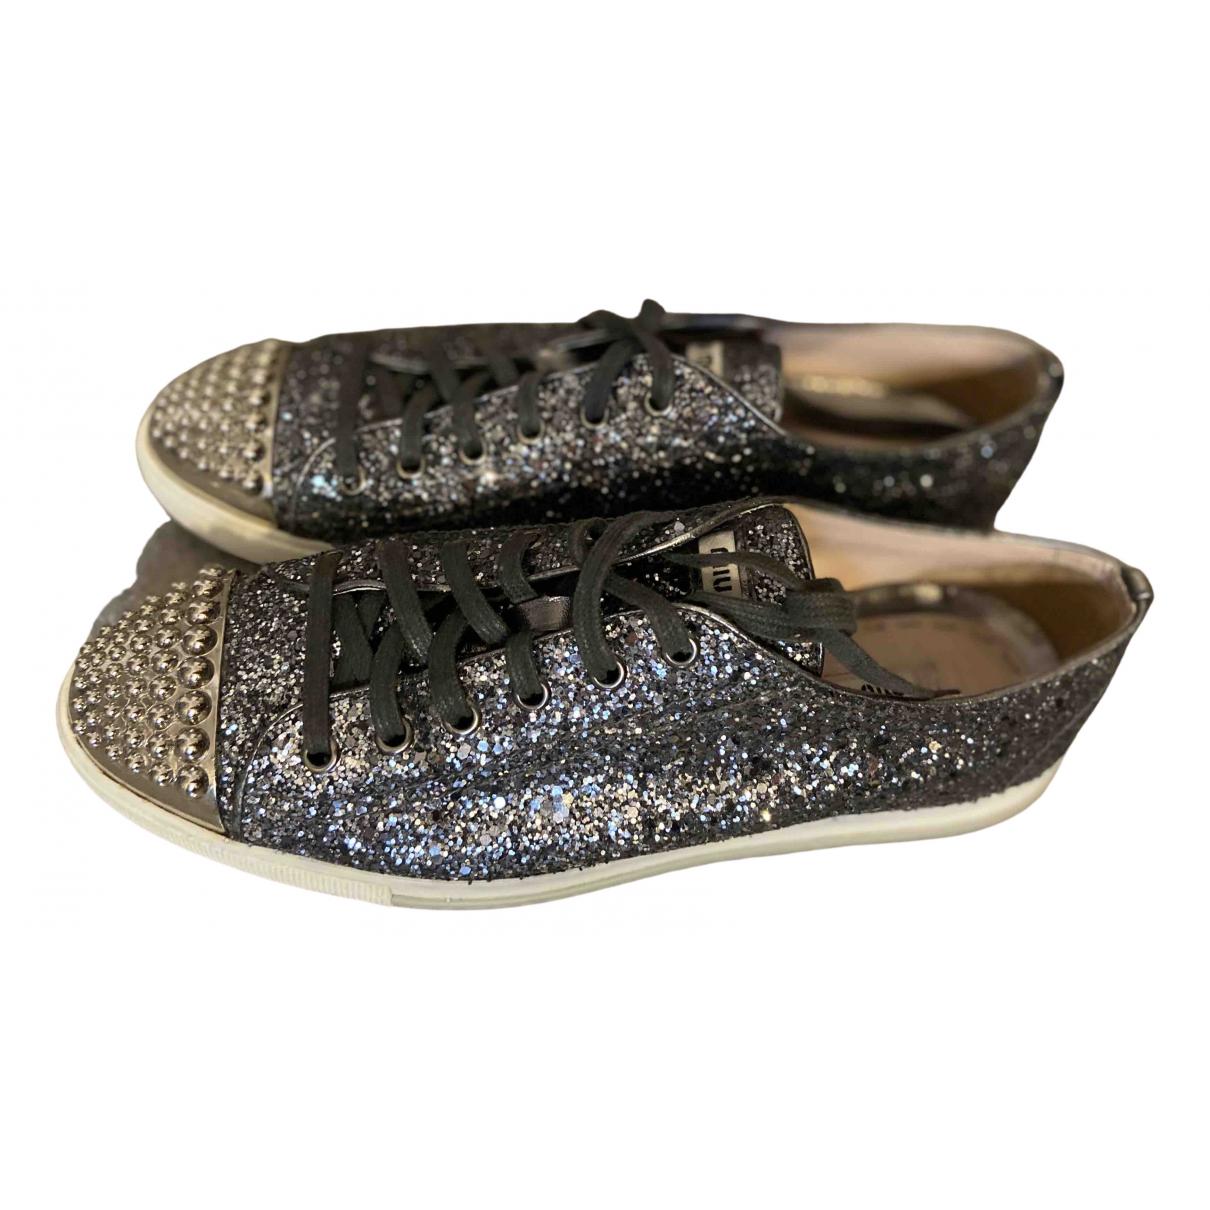 Miu Miu \N Sneakers in  Metallic Mit Pailletten